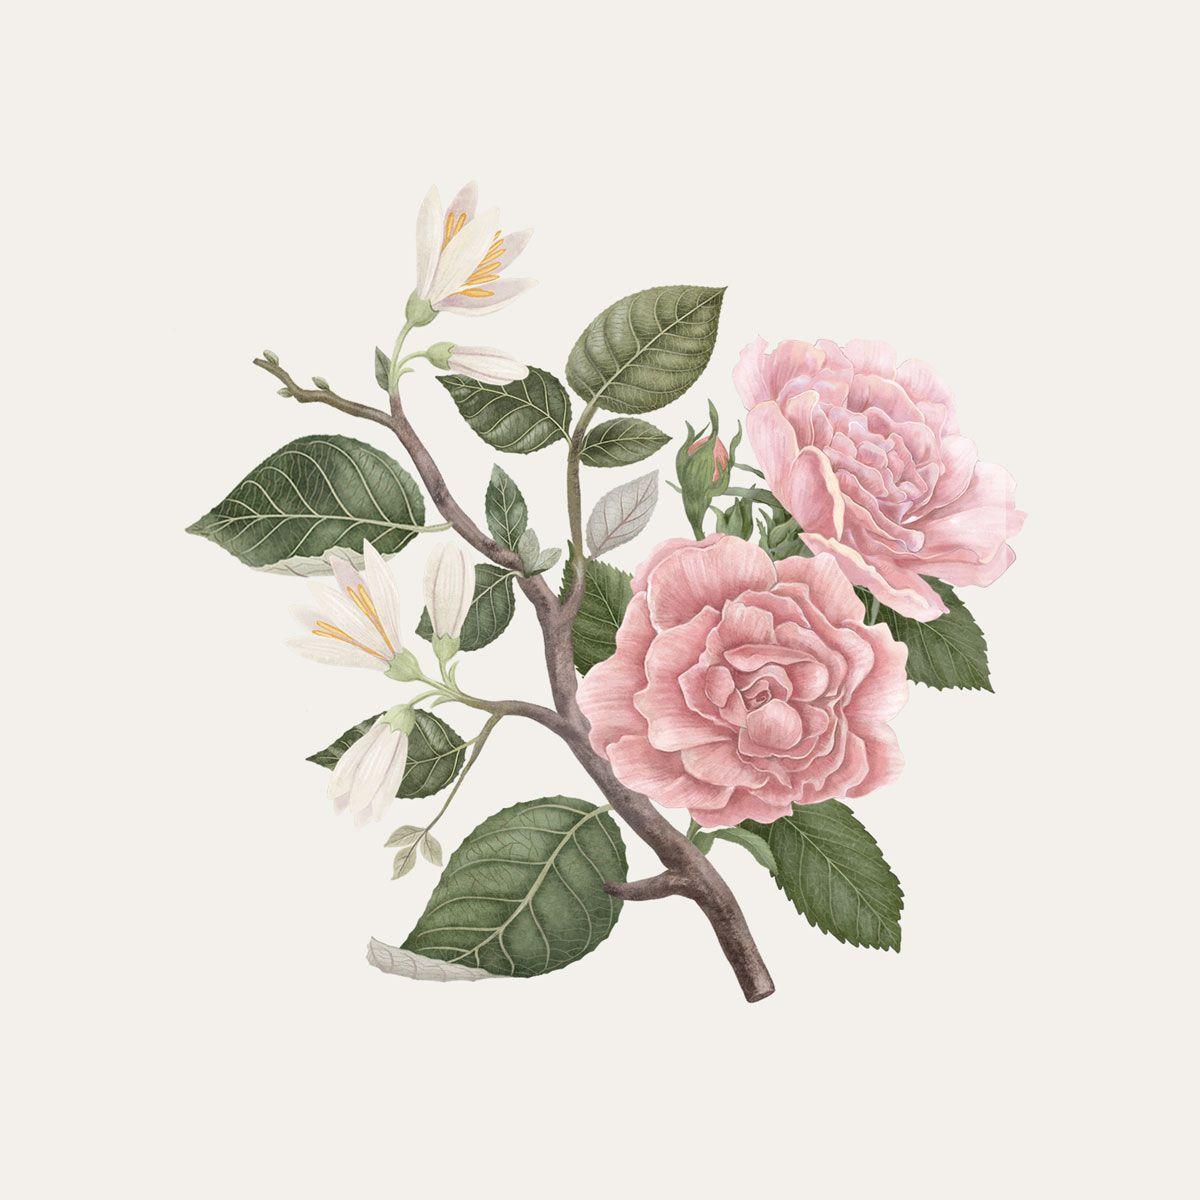 Benjoin et Rose